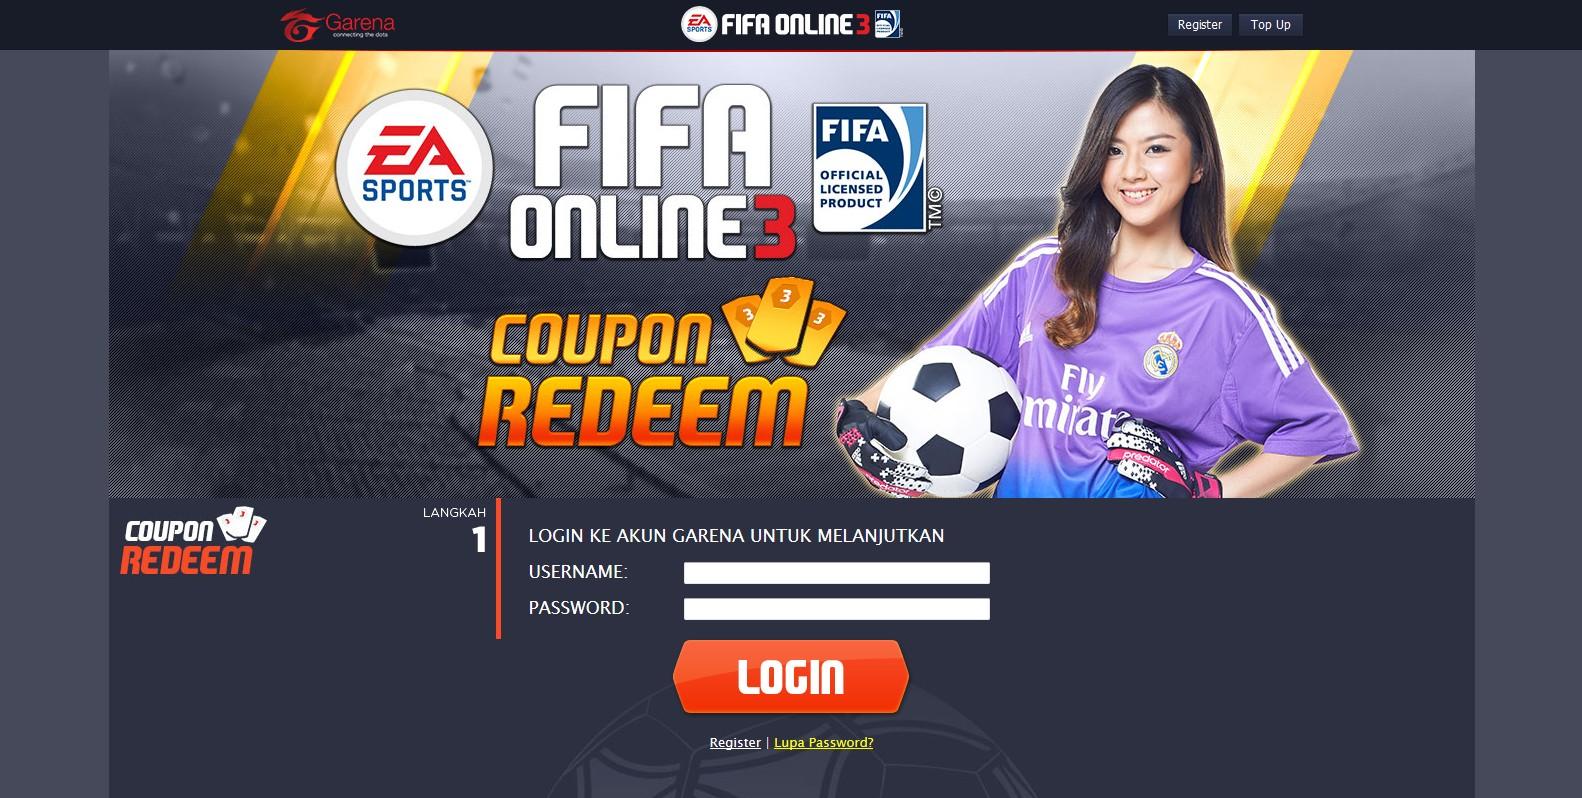 fifa online 3 coupon redeem code free